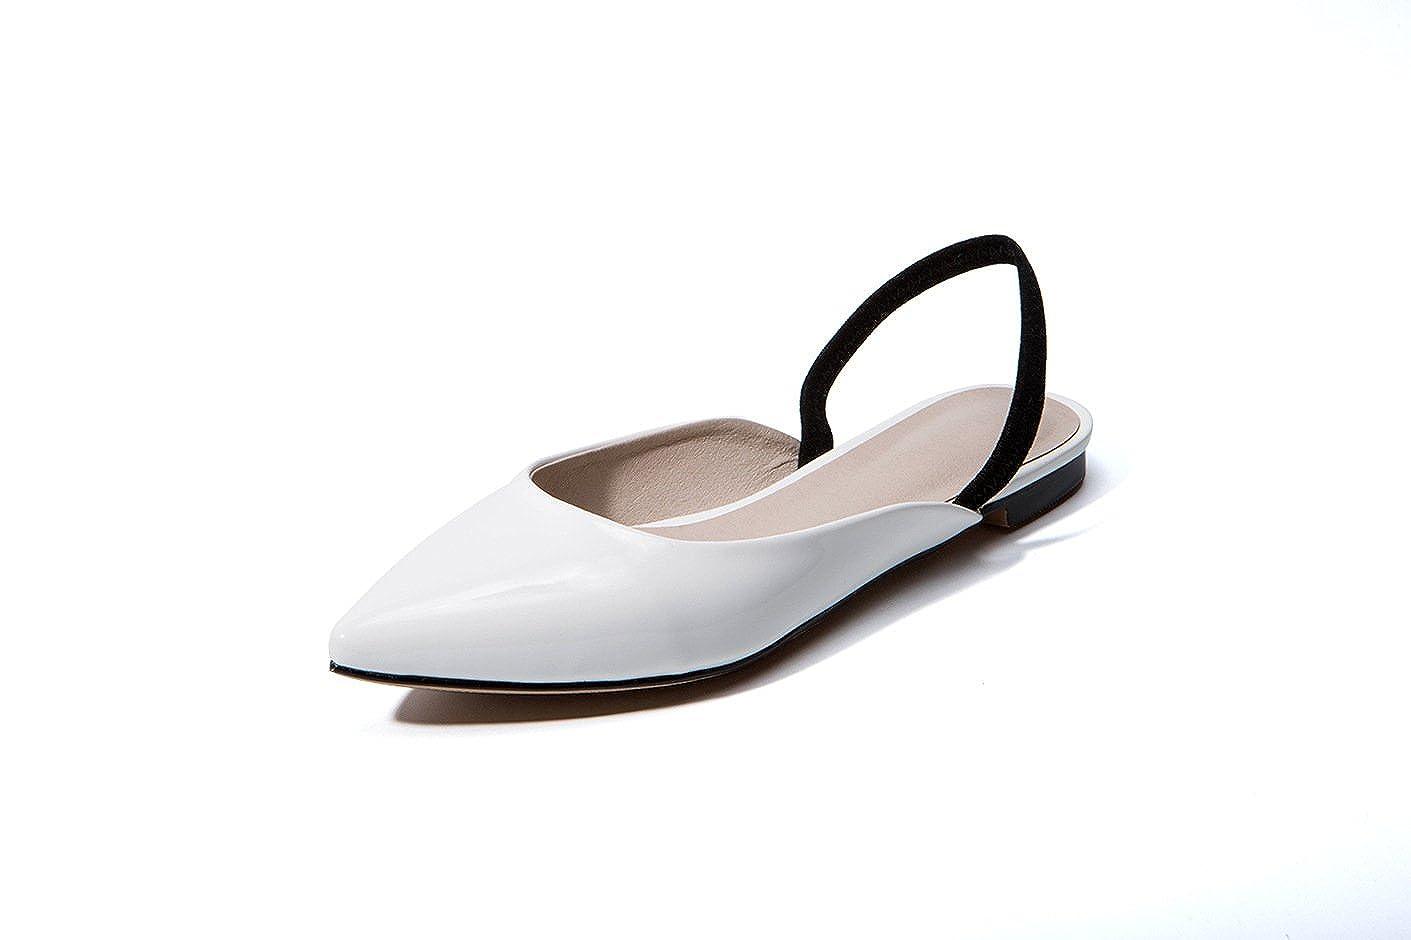 Unbekannt Damen Sandalen Flachbild Baotou Gummizug Rücktaste Hingewiesen Weiß 40